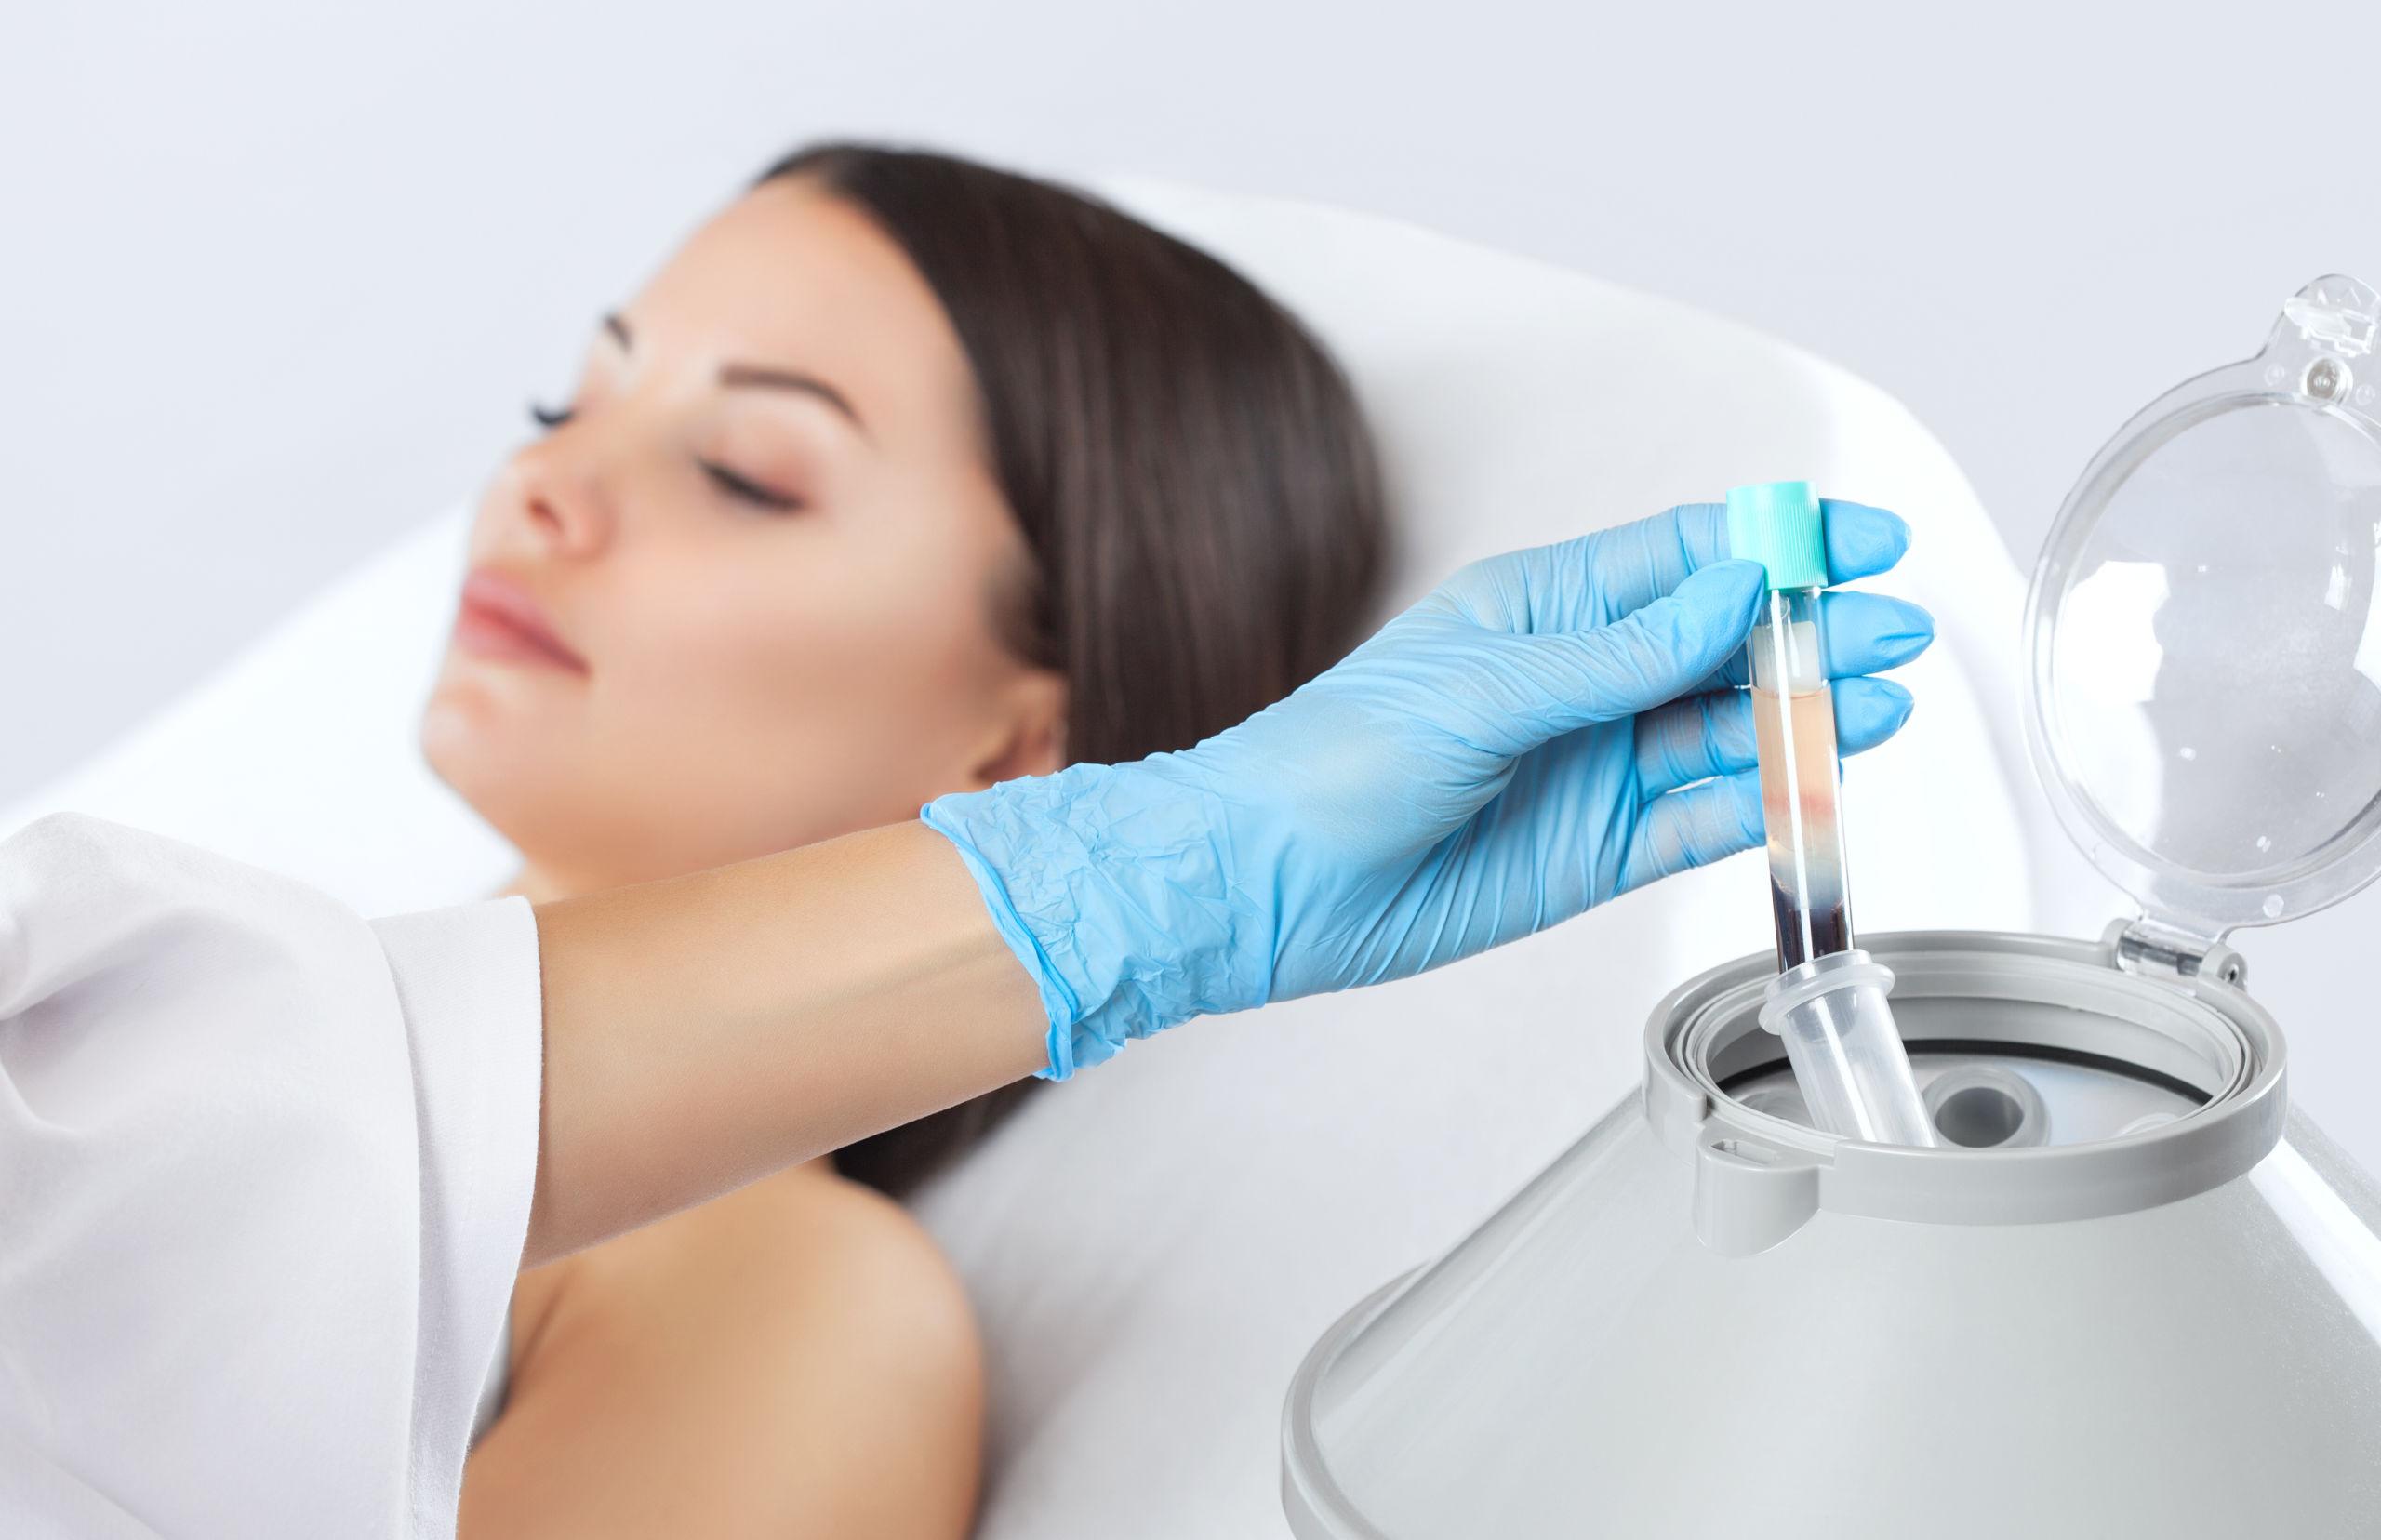 SKN – 4.1 Platelet-Rich Plasma (PRP) Therapy